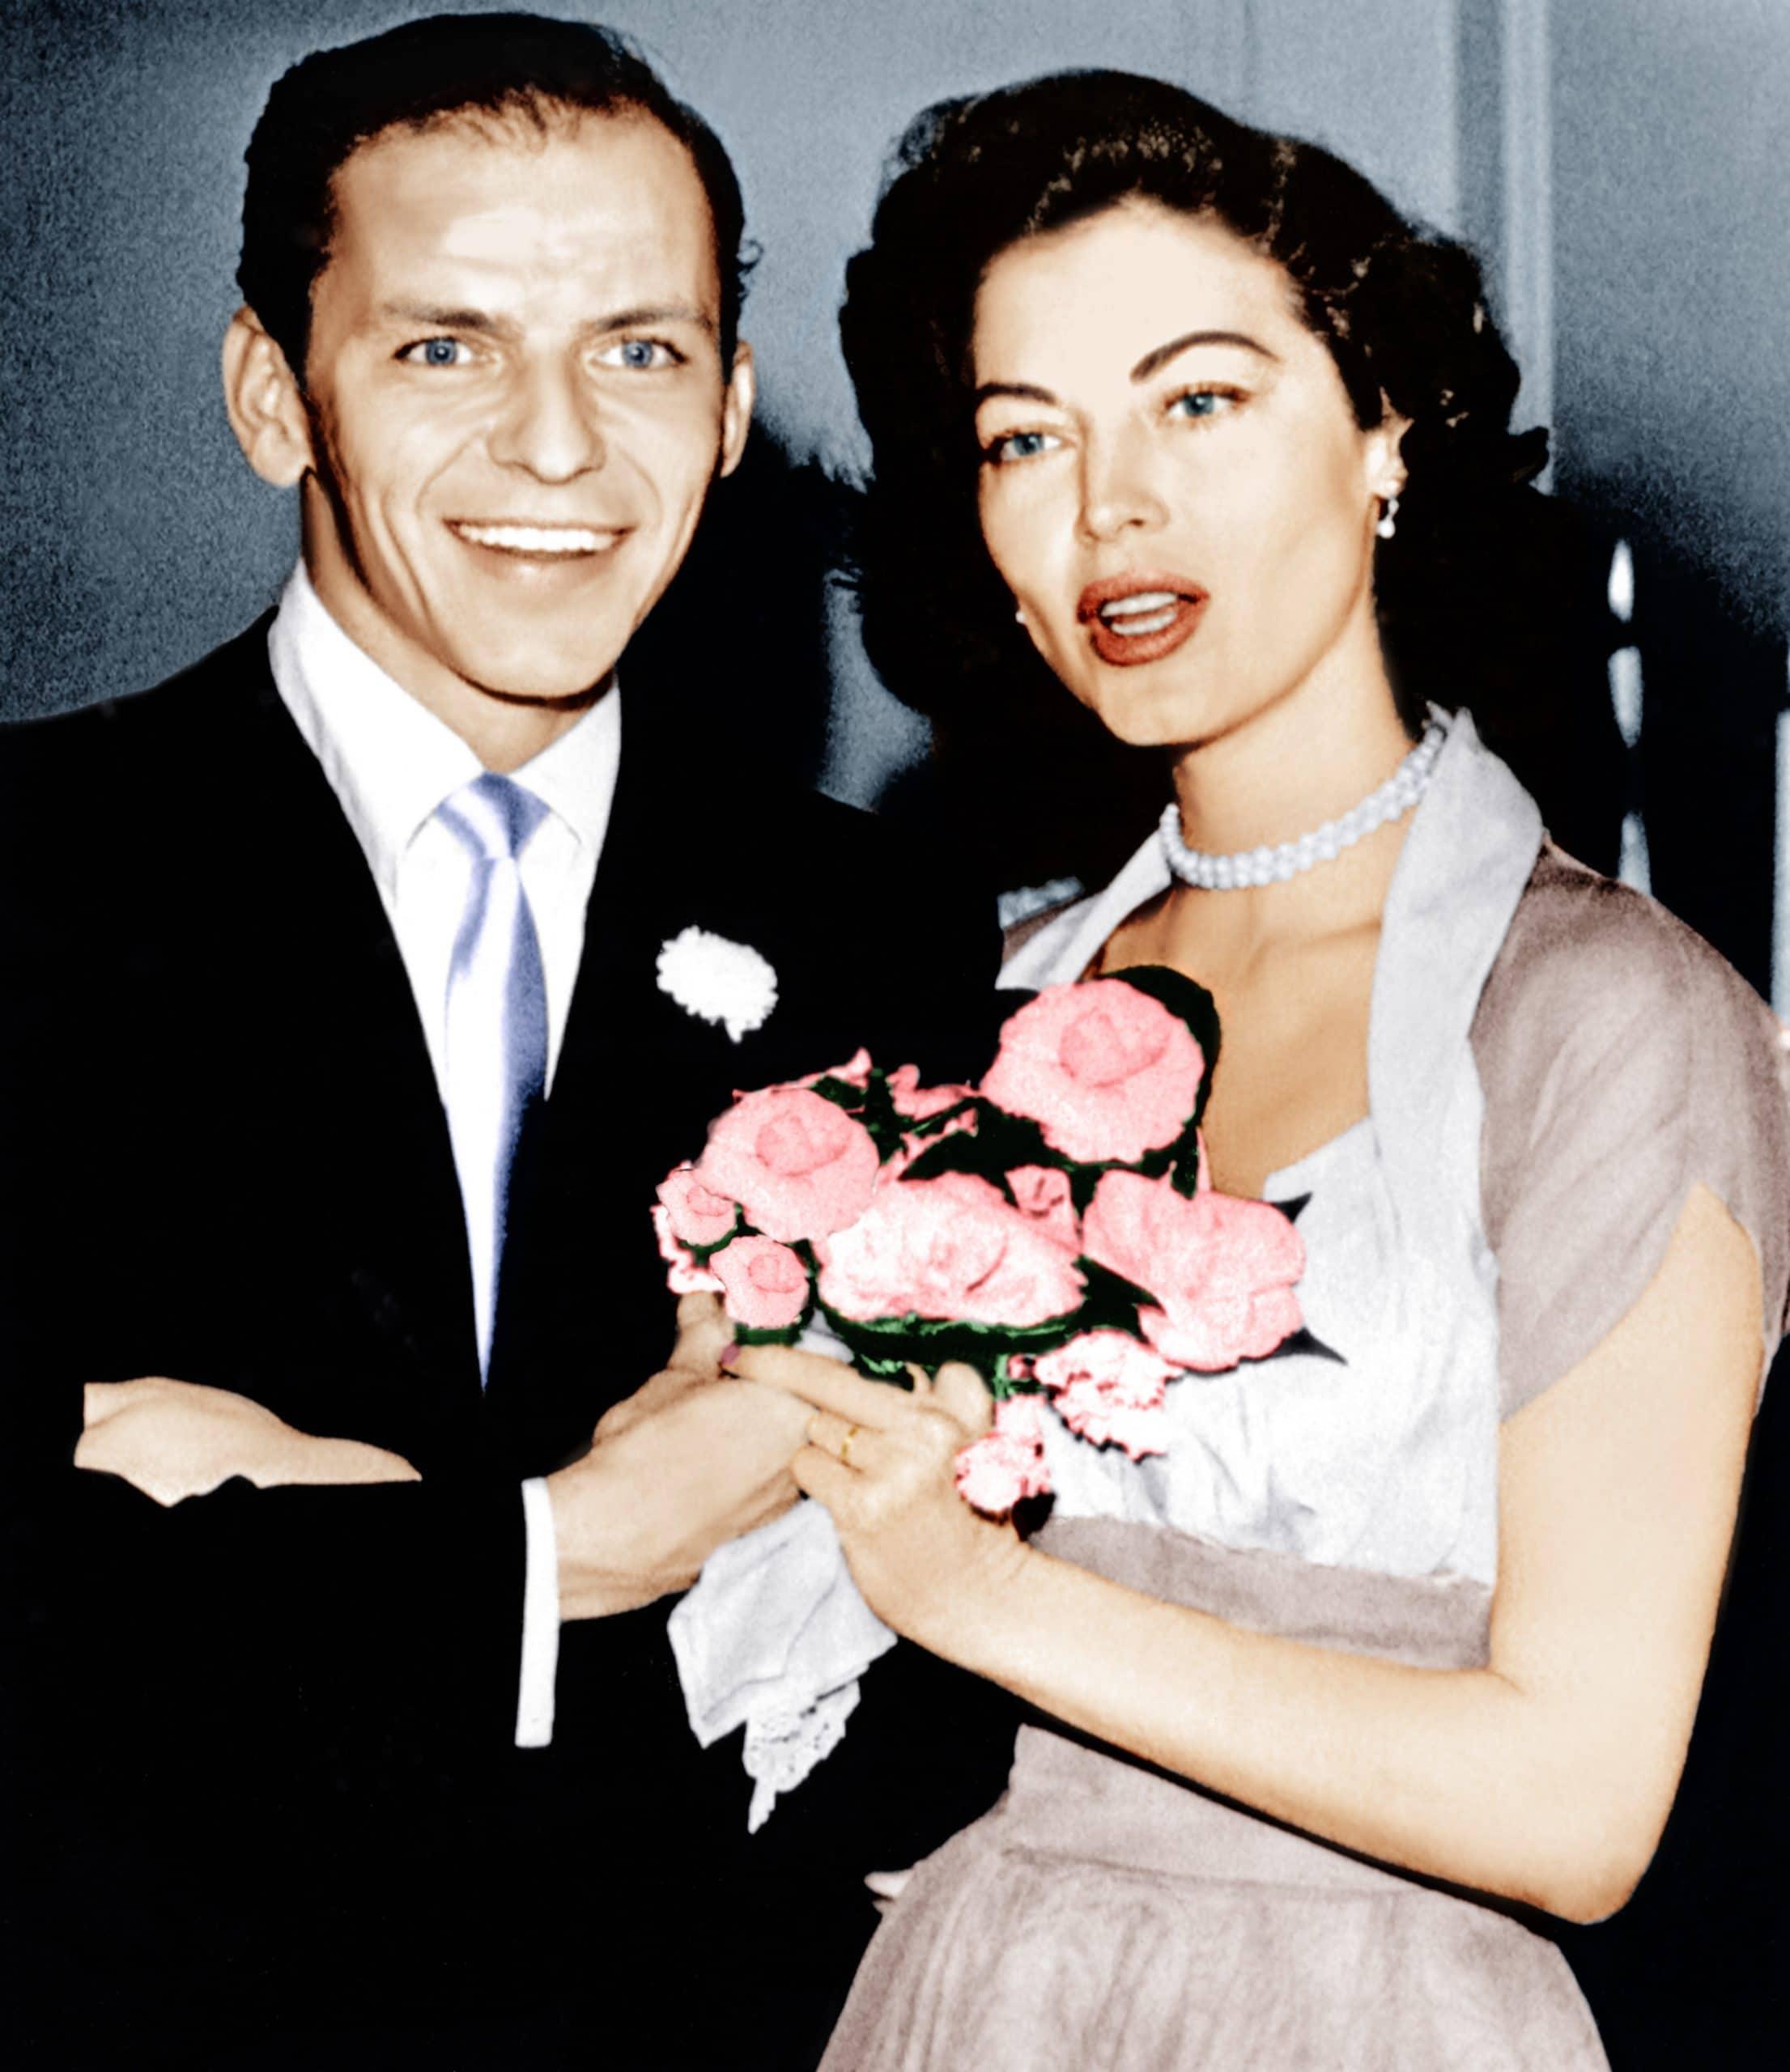 Frank Sinatra, Ava Gardner on their wedding day, 1951